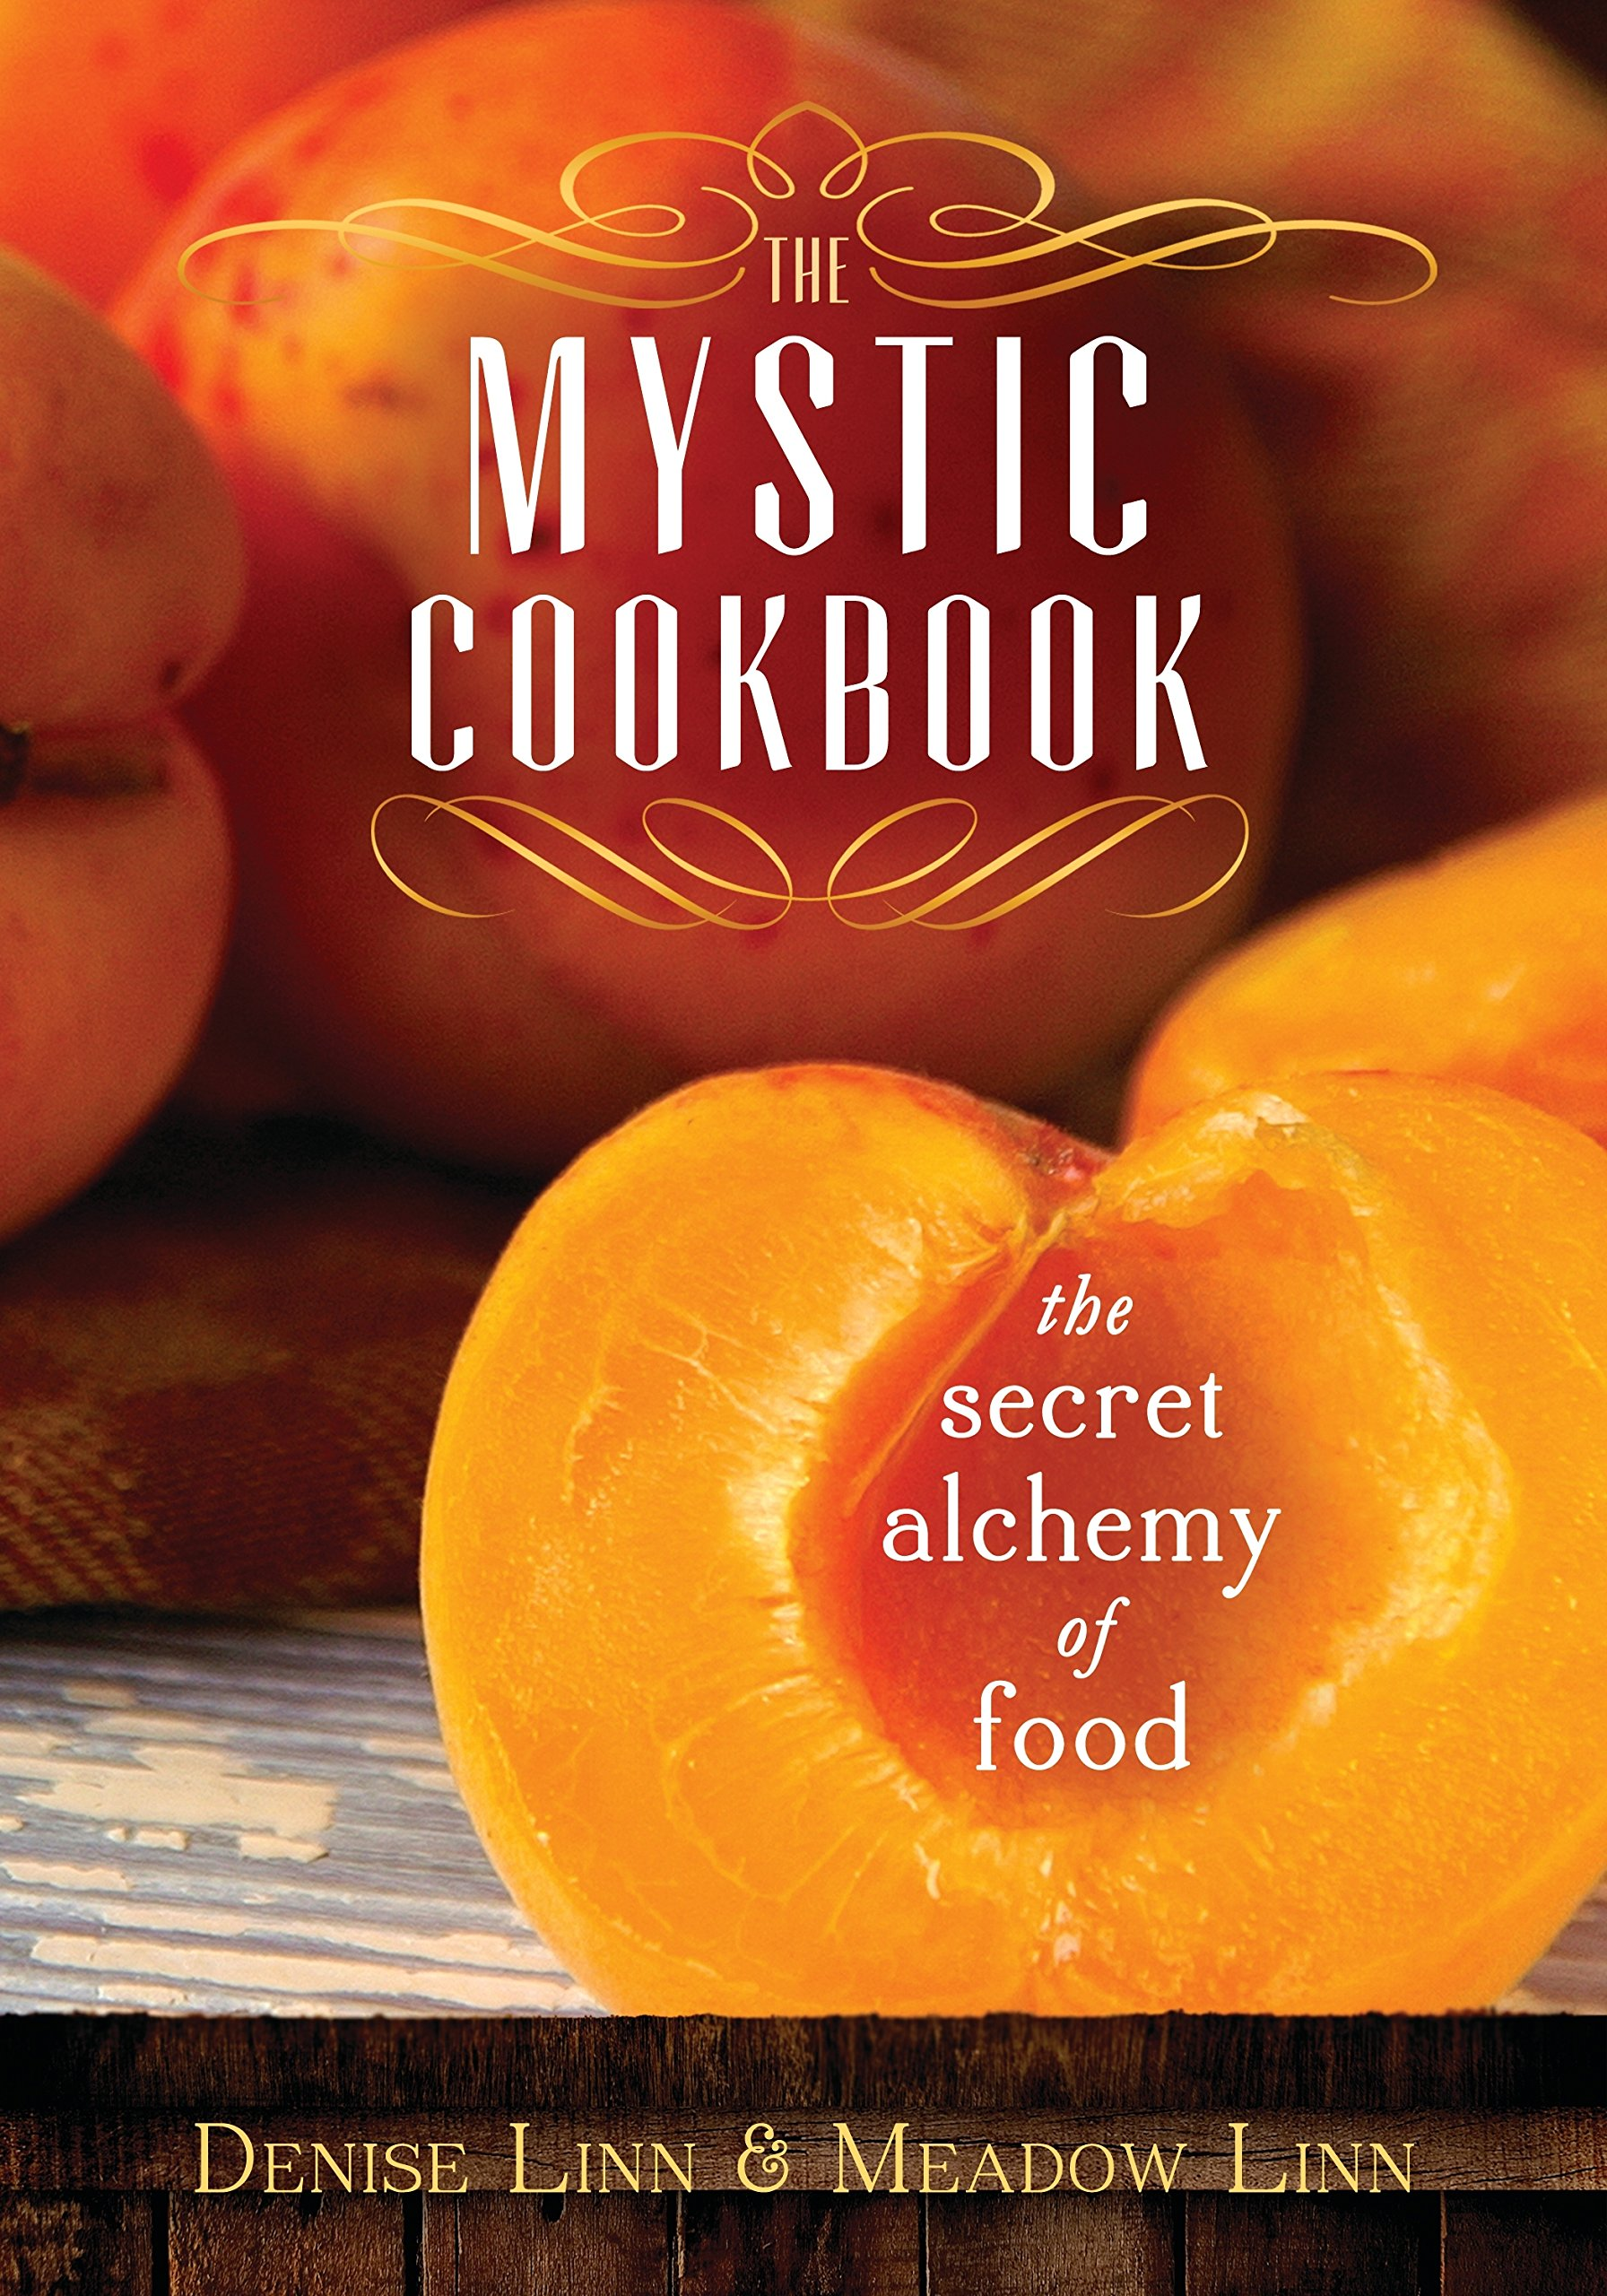 The Mystic Cookbook The Secret Alchemy Of Food Denise Linn Meadow